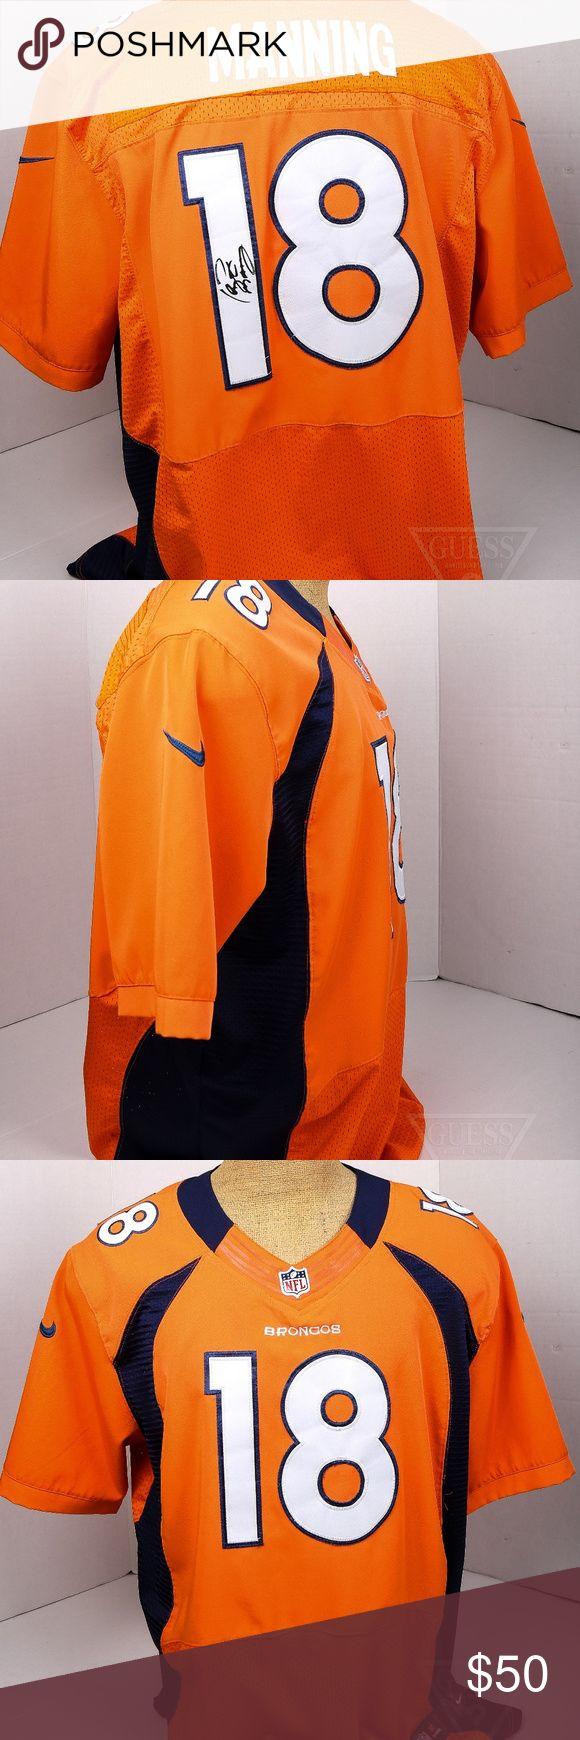 Men's NIKE Peyton MAnning jersey w Signature sz 52 Signed Men's NIKE Peyton MAnning jersey sz 52. autograph is printed on the number. Nike Shirts